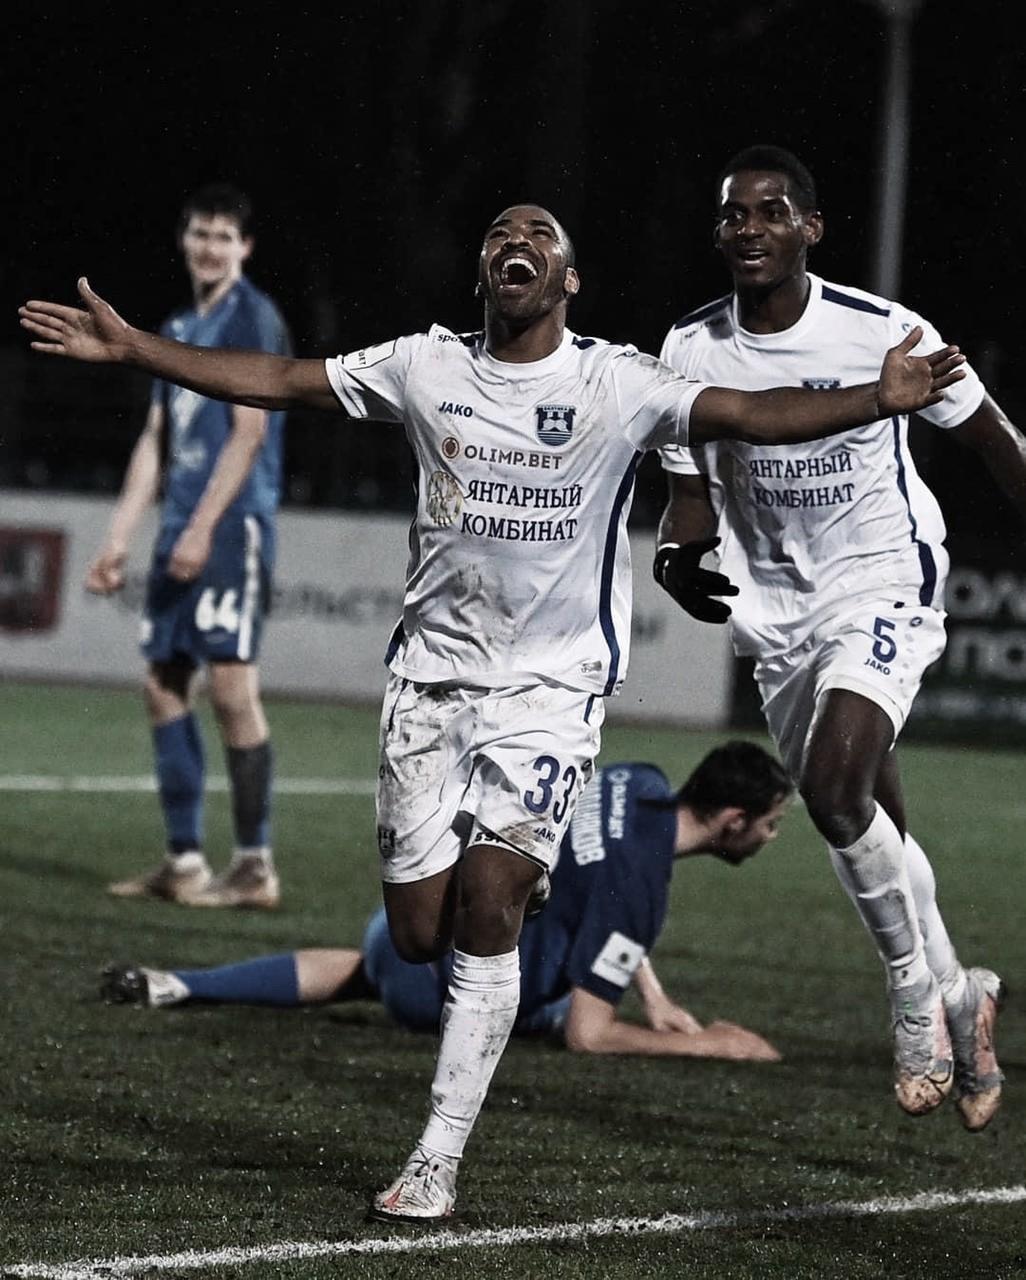 Na Rússia, atacante Allef Andrade comemora gol e mira acesso para Premier League